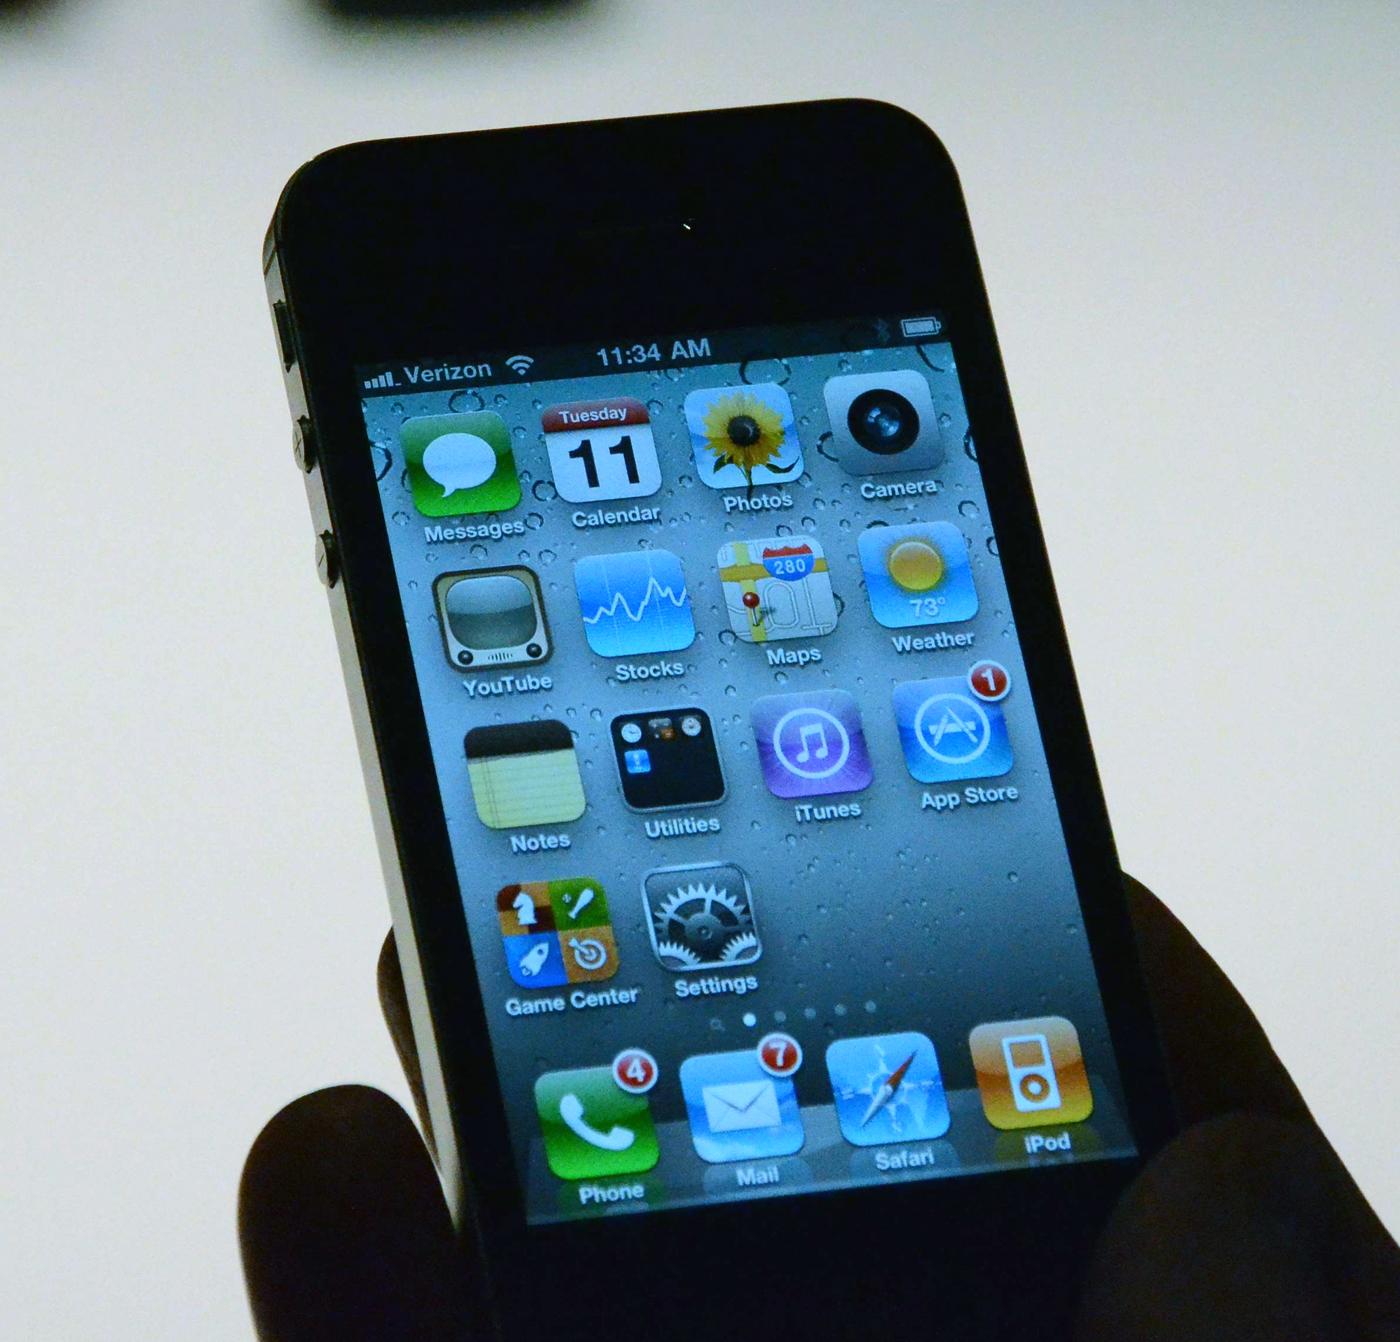 iPhone 4 rodando na Verizon